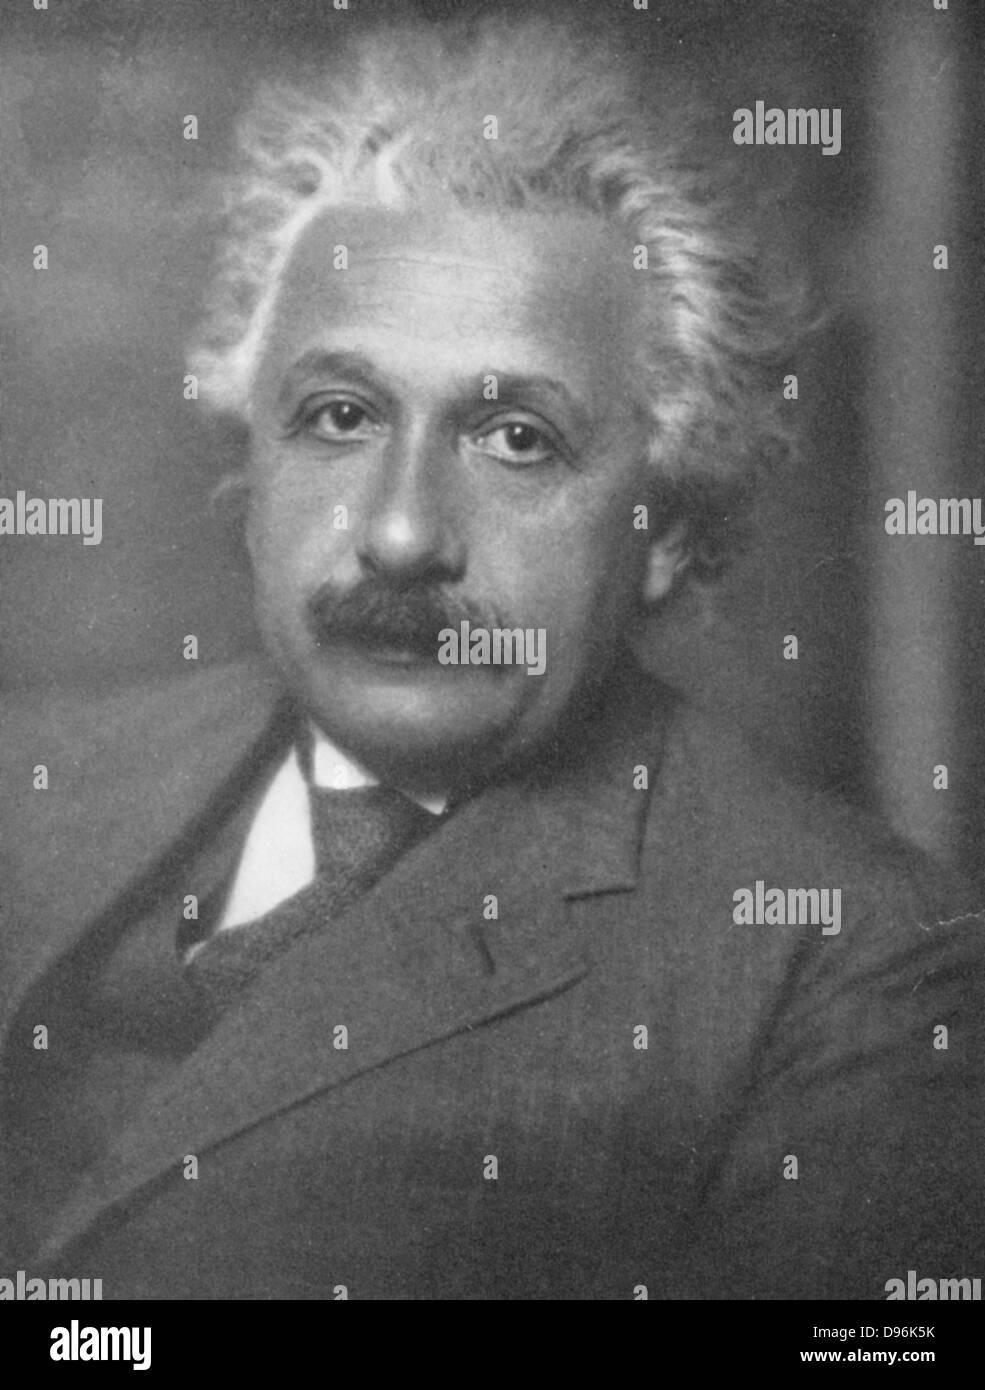 Albert Einstein (1879-1955), German-Swiss-American mathematician and physicist - Stock Image